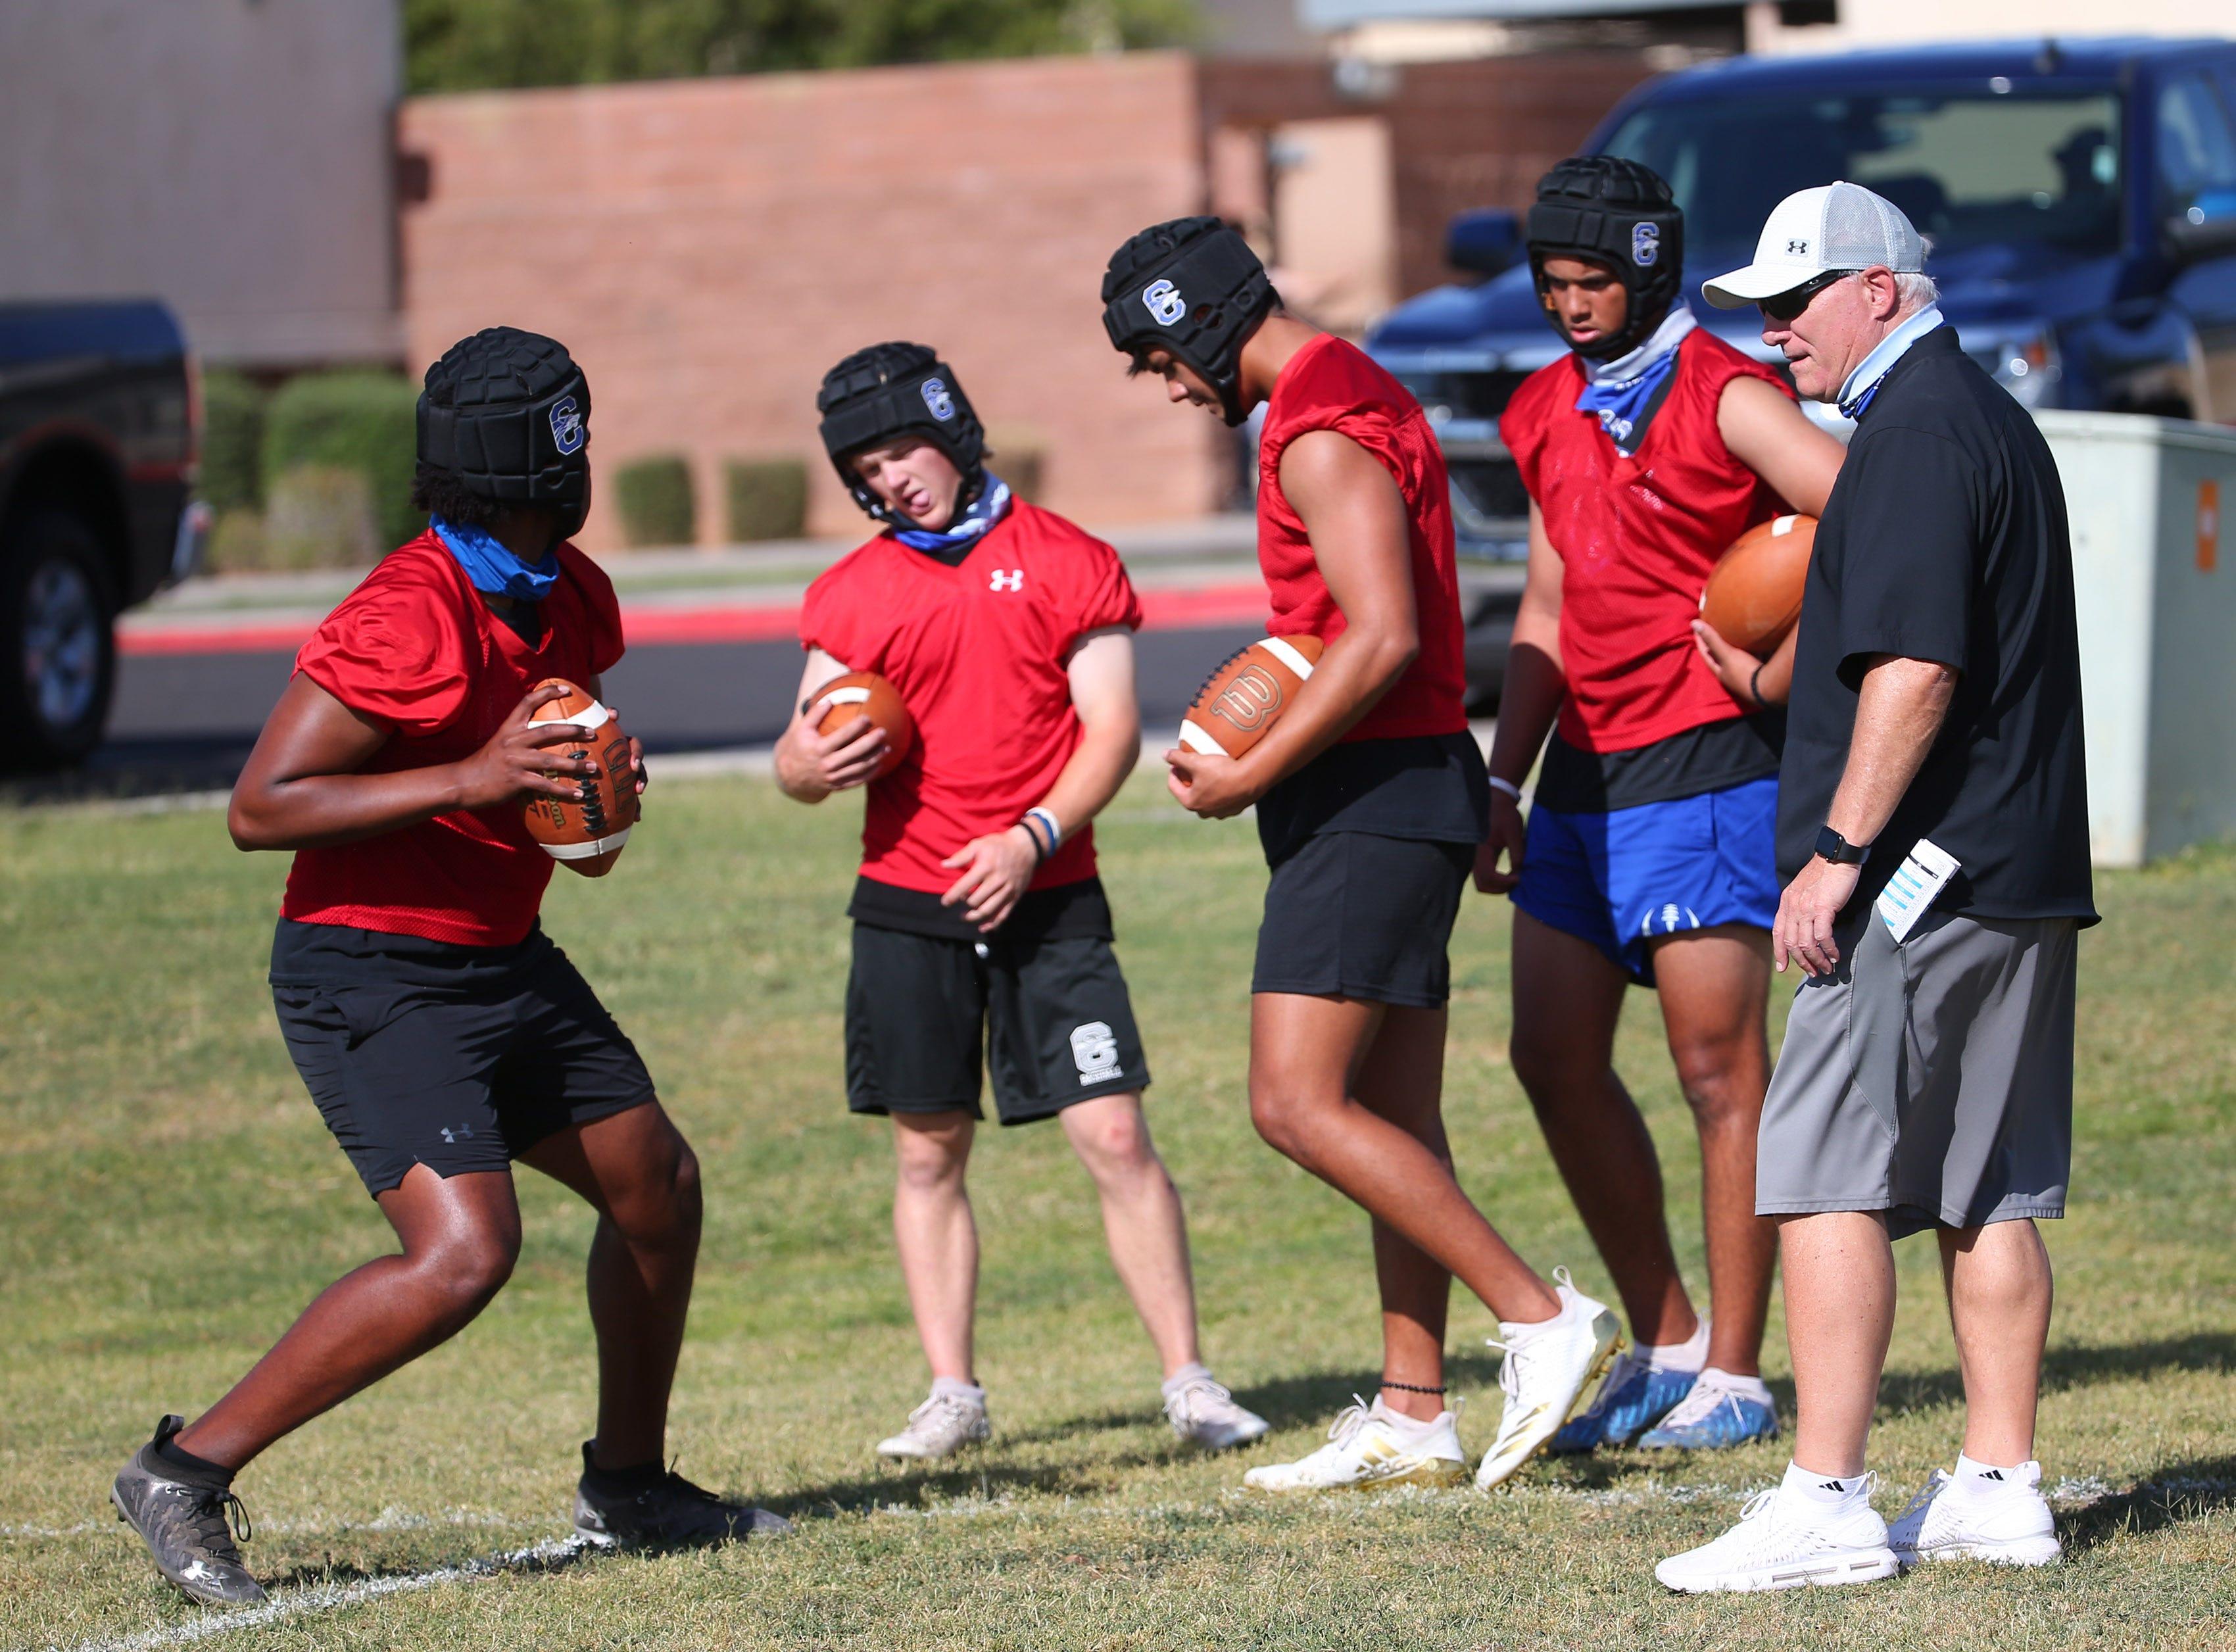 Big quarterback battle being held during Chandler spring football